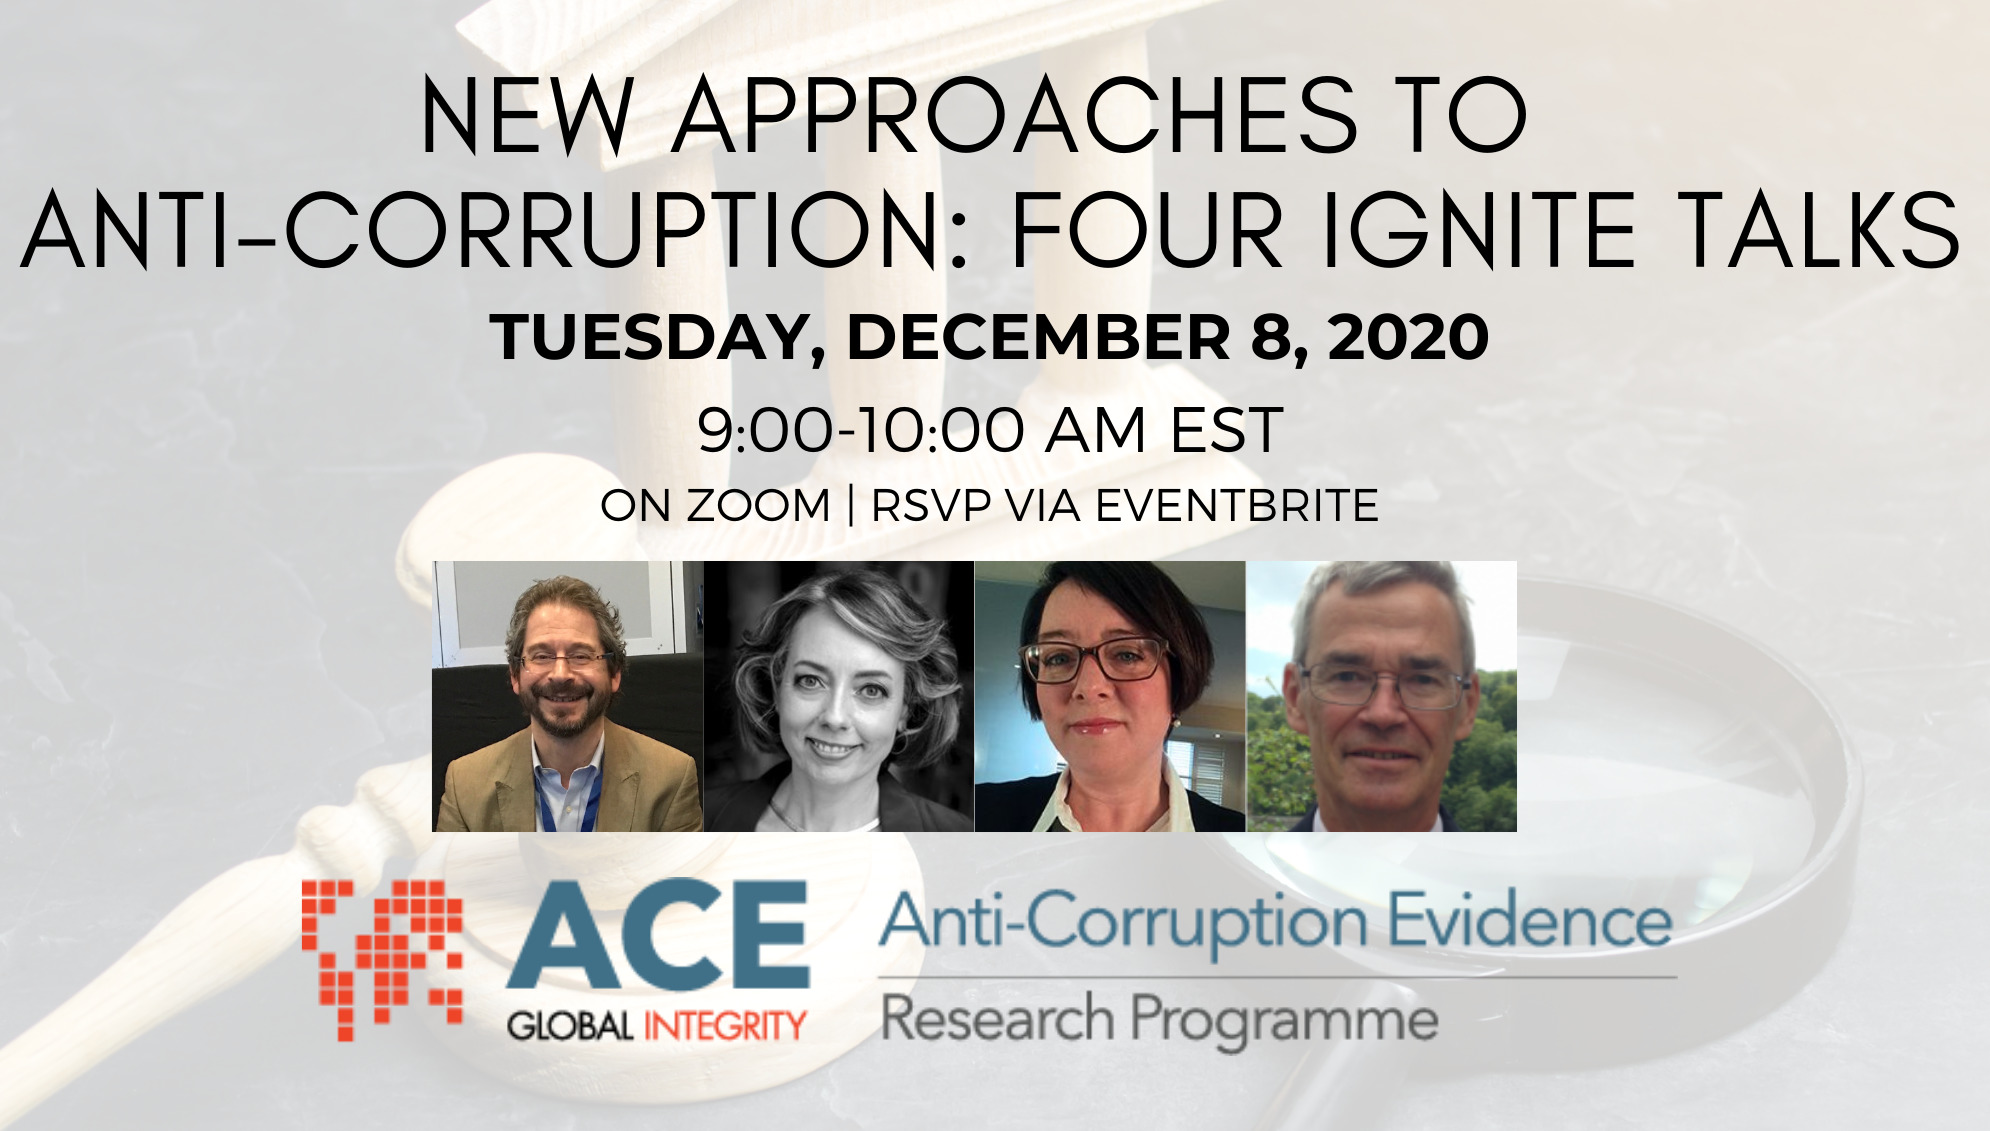 anticorruption talks